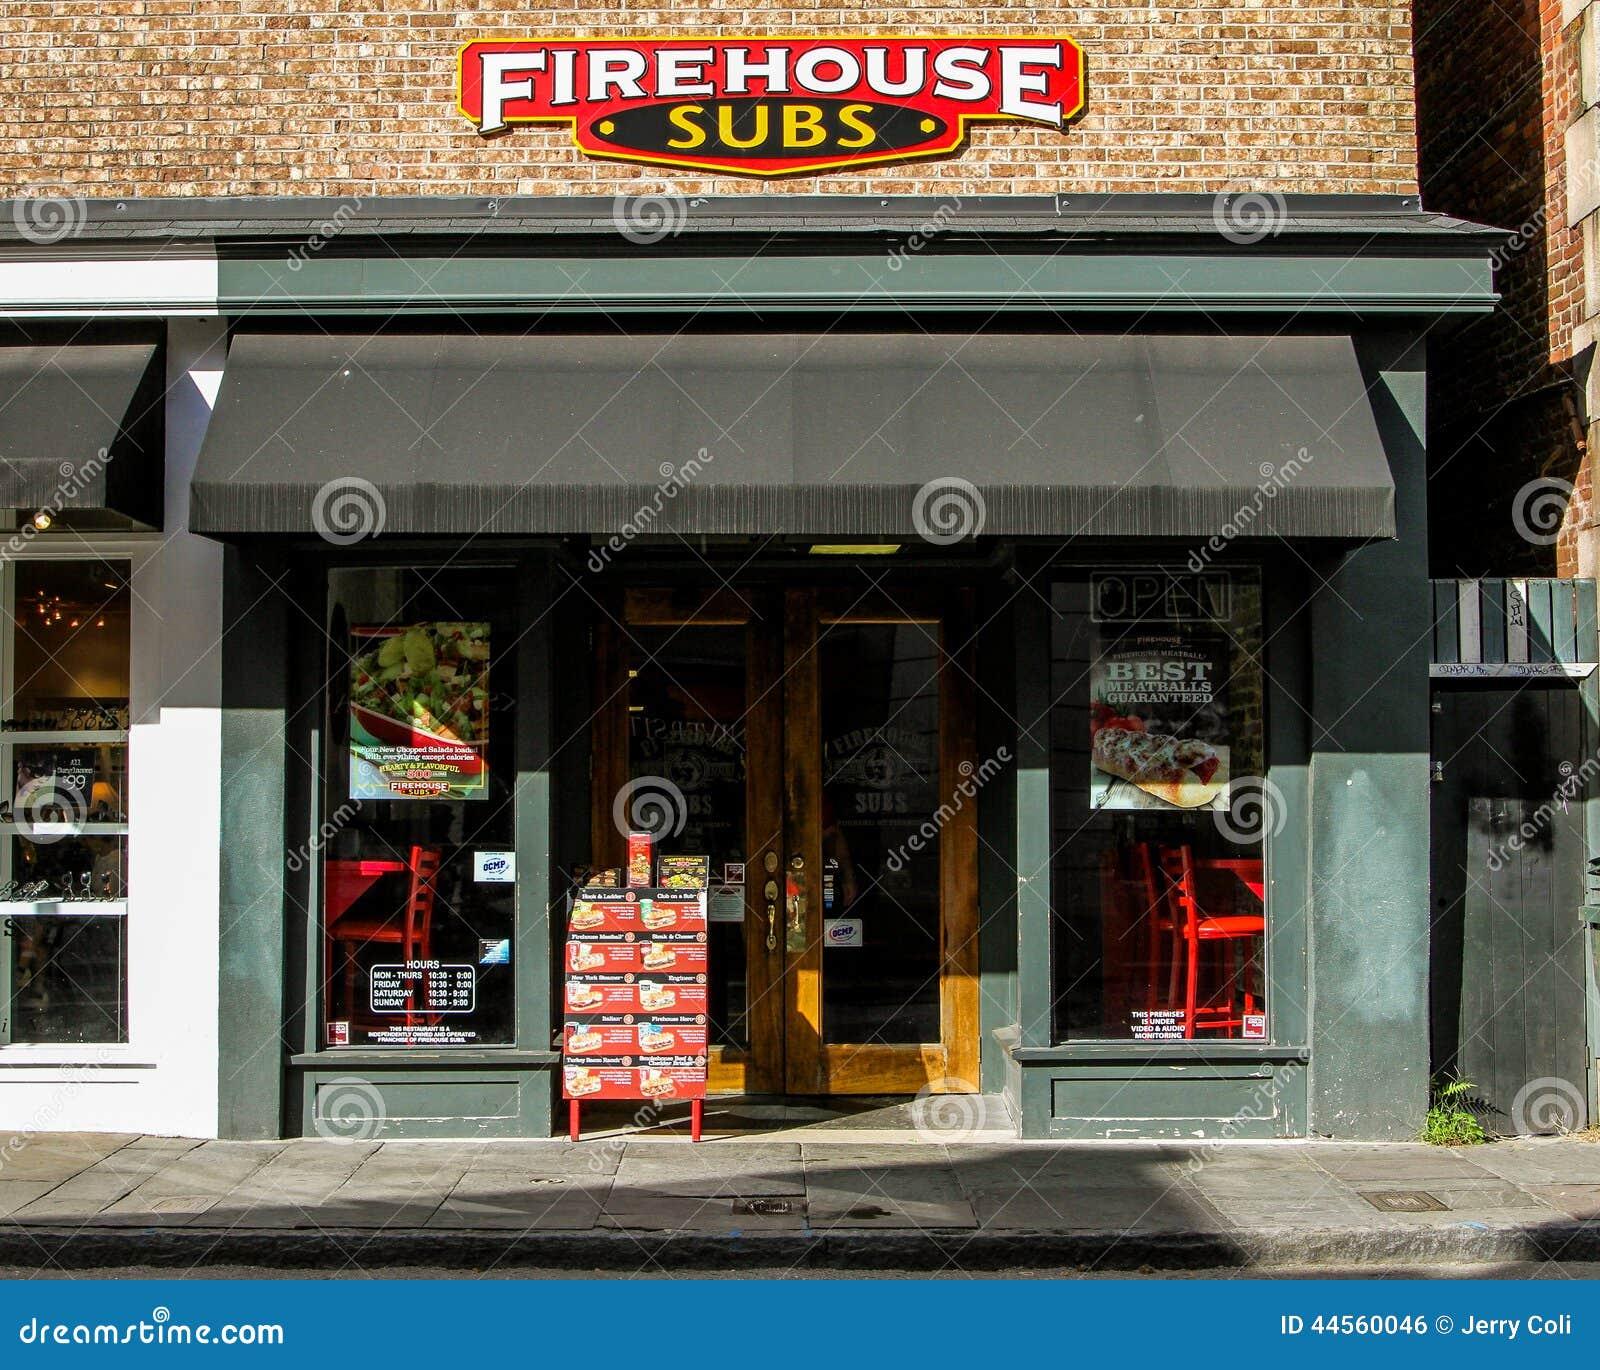 King St Charleston Sc: Firehouse Subs, King Street, Charleston, SC. Editorial